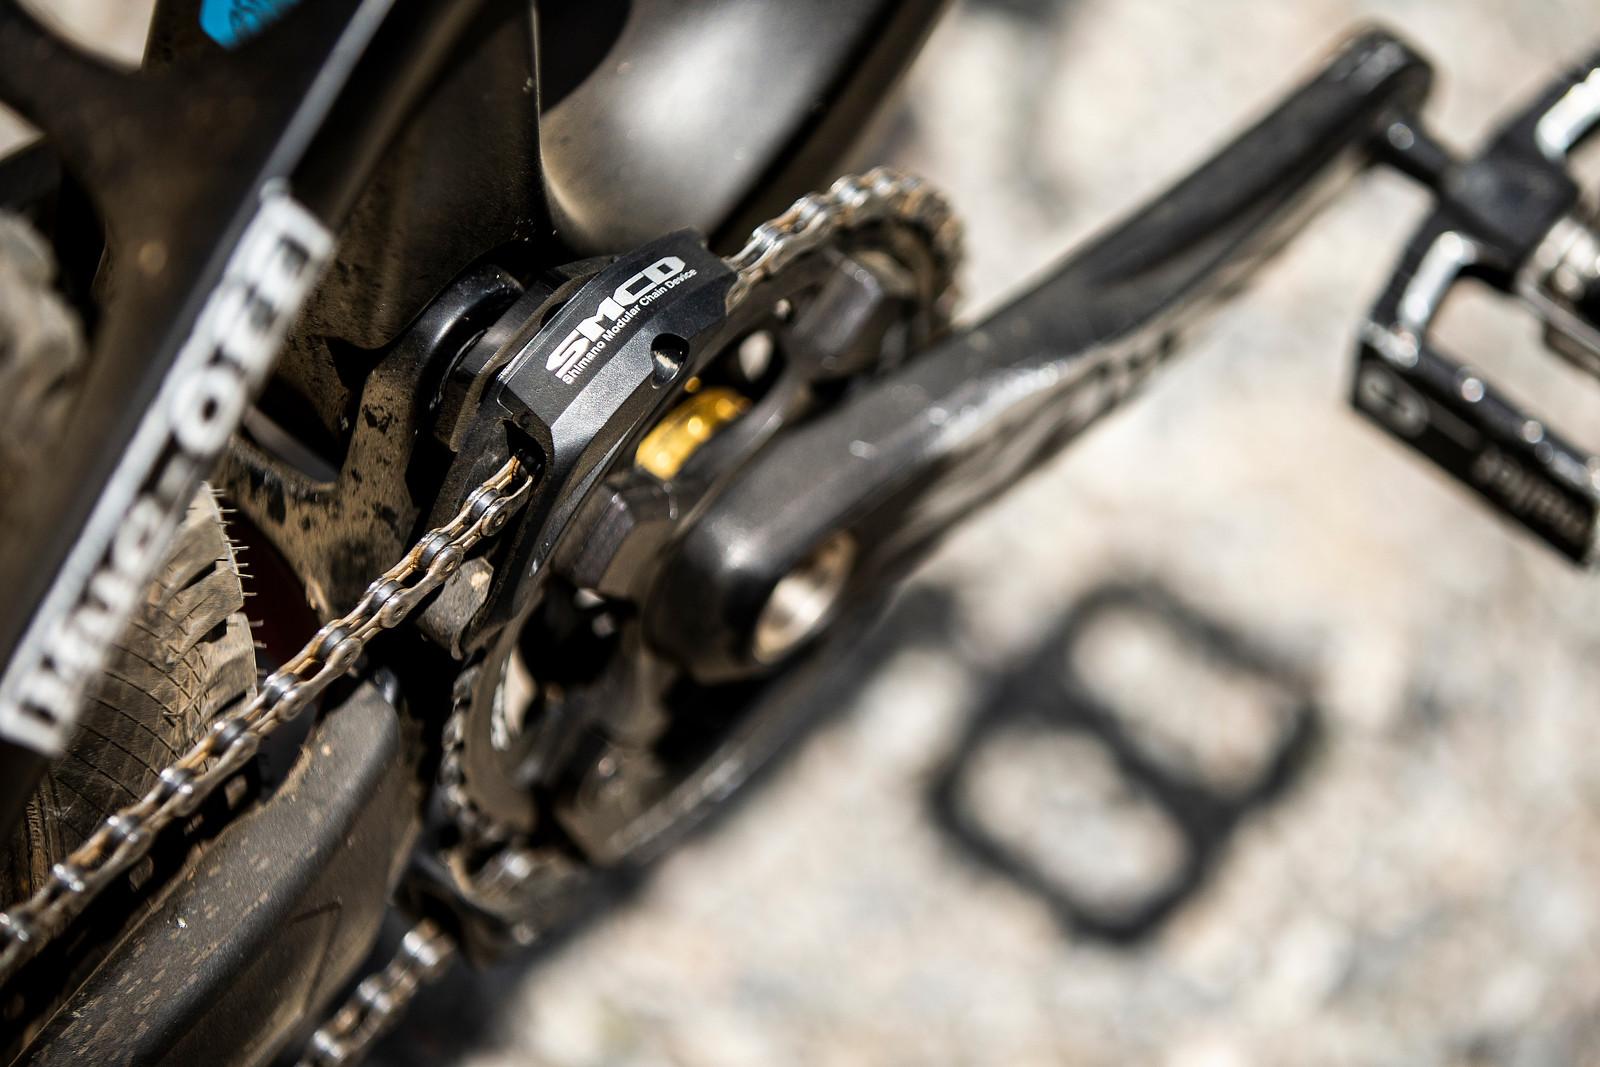 Shimano SMCD Chain Guide - WINNING BIKE - Tahnee Seagrave's Transition TR11 - Mountain Biking Pictures - Vital MTB